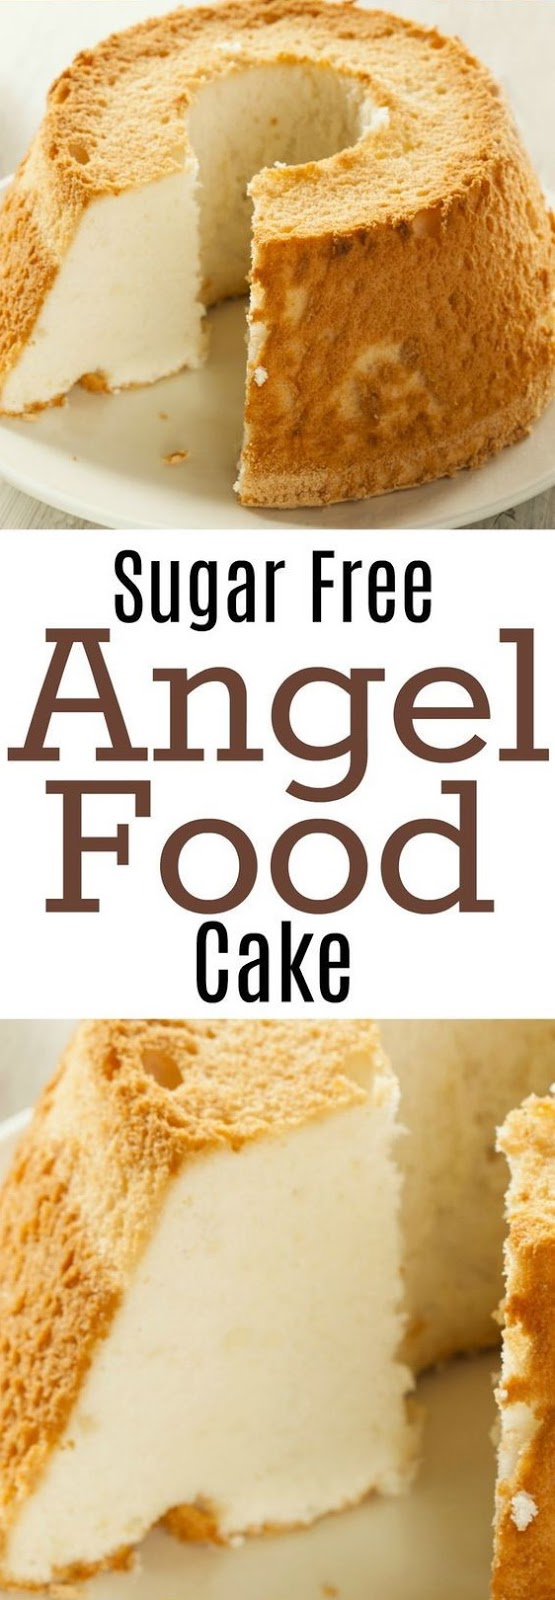 Sugar Free Angel Food Cake